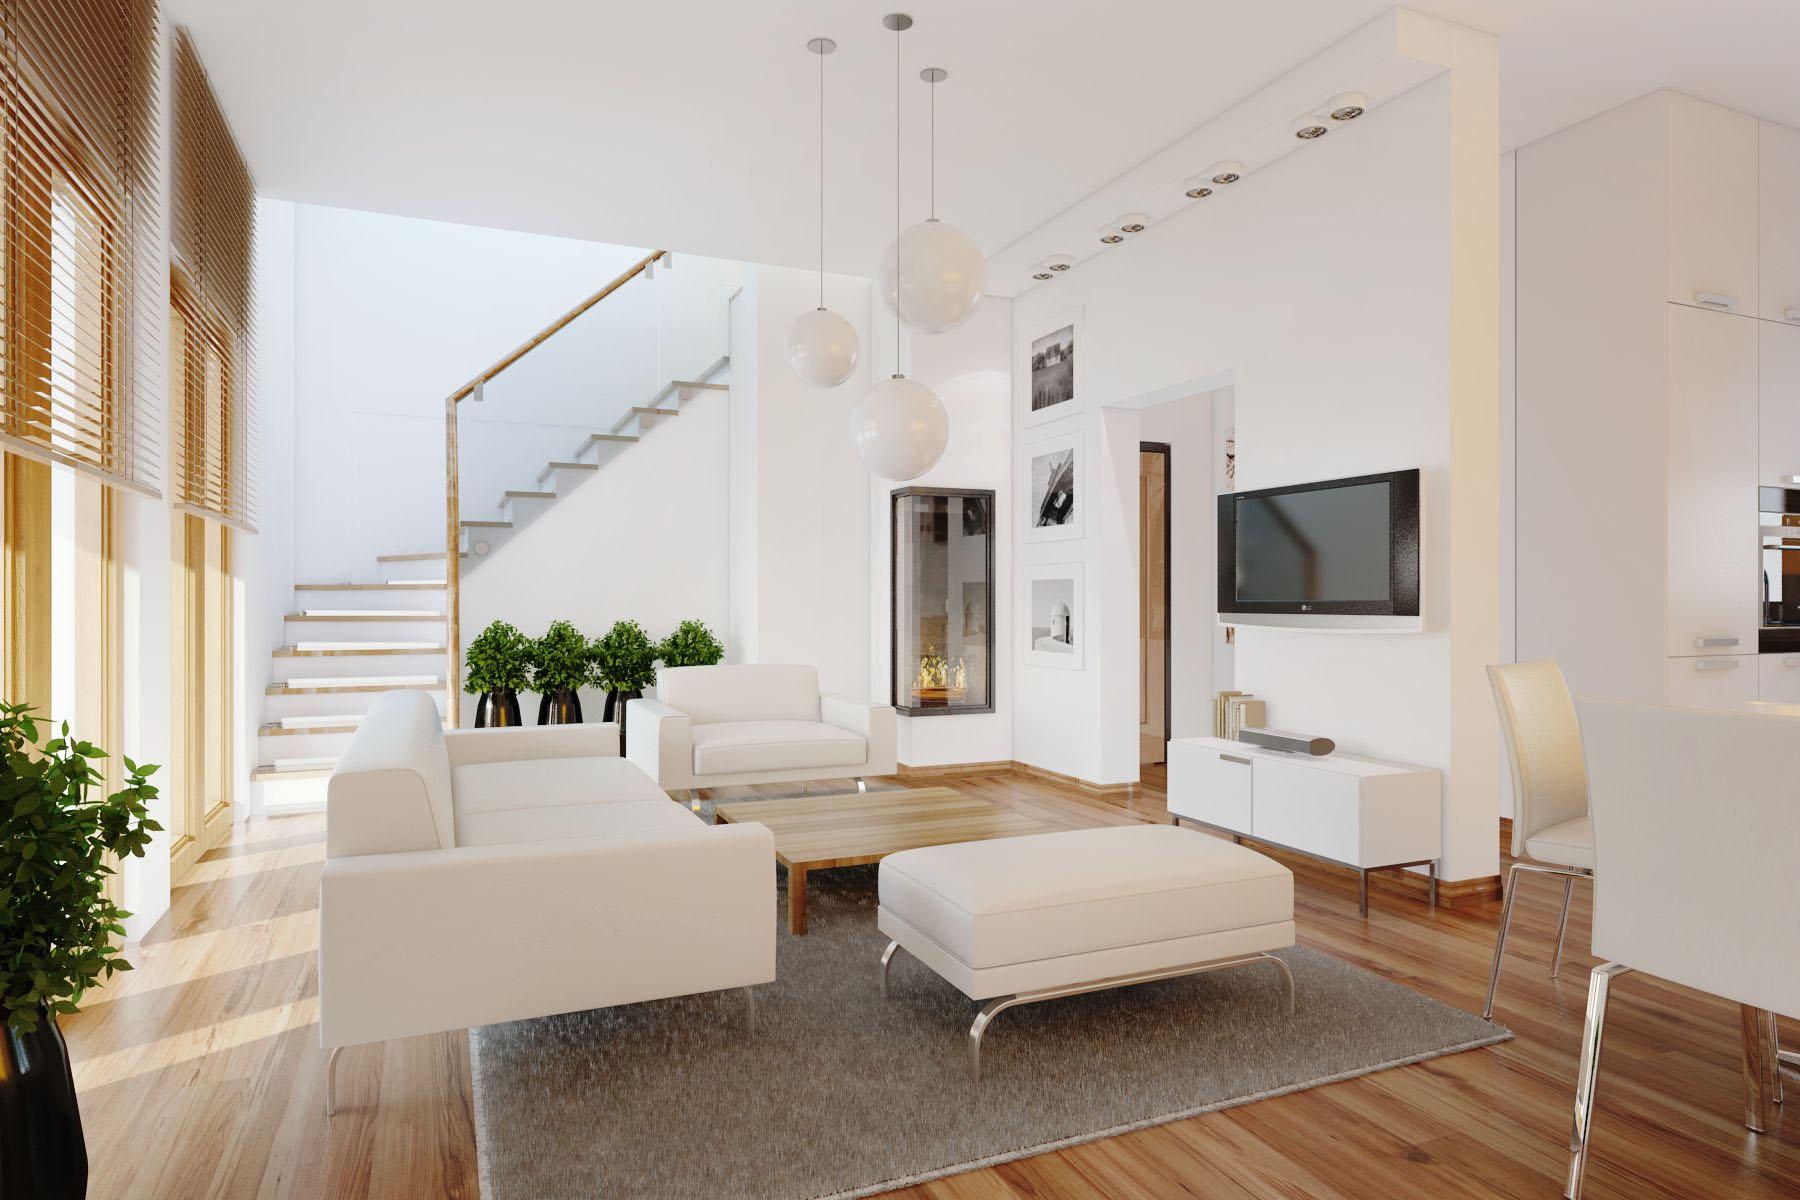 reka bentuk hiasan dalaman teres home interior design services Contoh hiasan dalaman ruang tamu minimalis rumah teres 2 tingkat